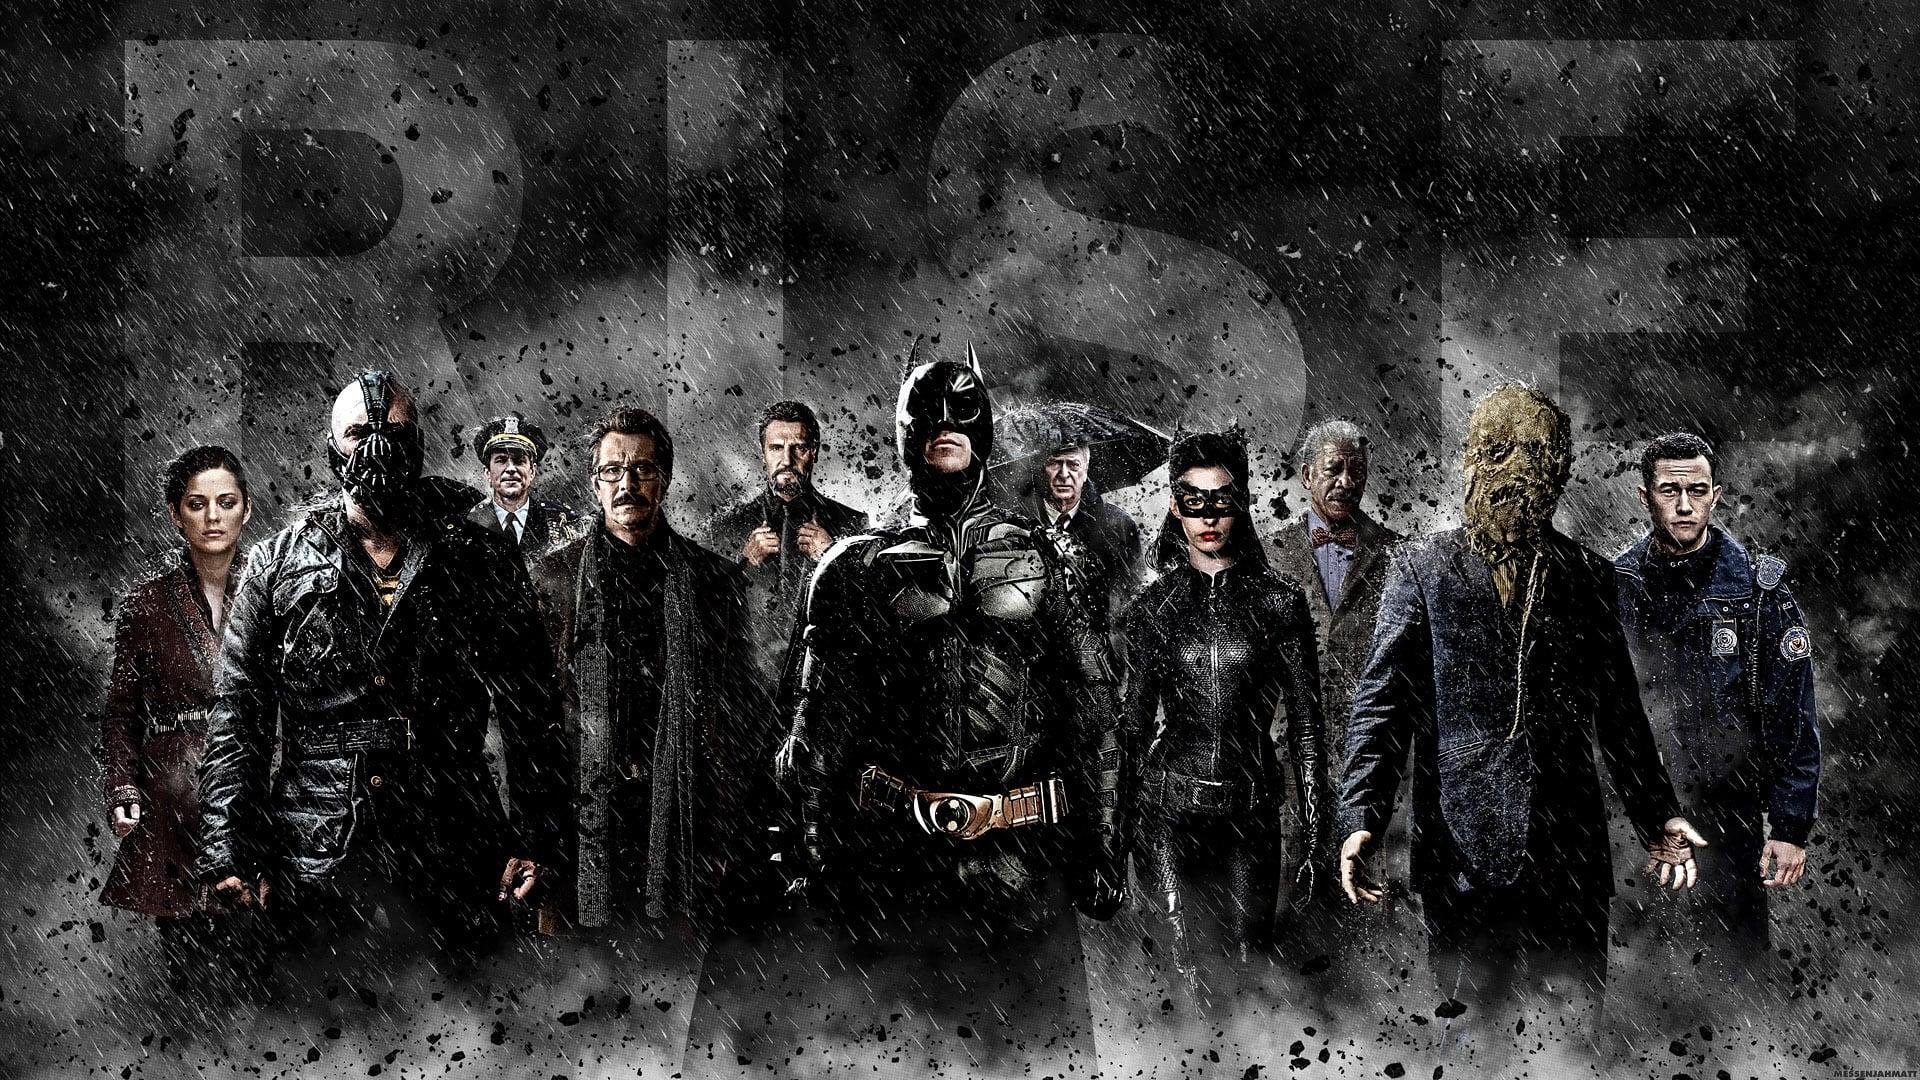 Filmszene aus The Dark Knight Rises